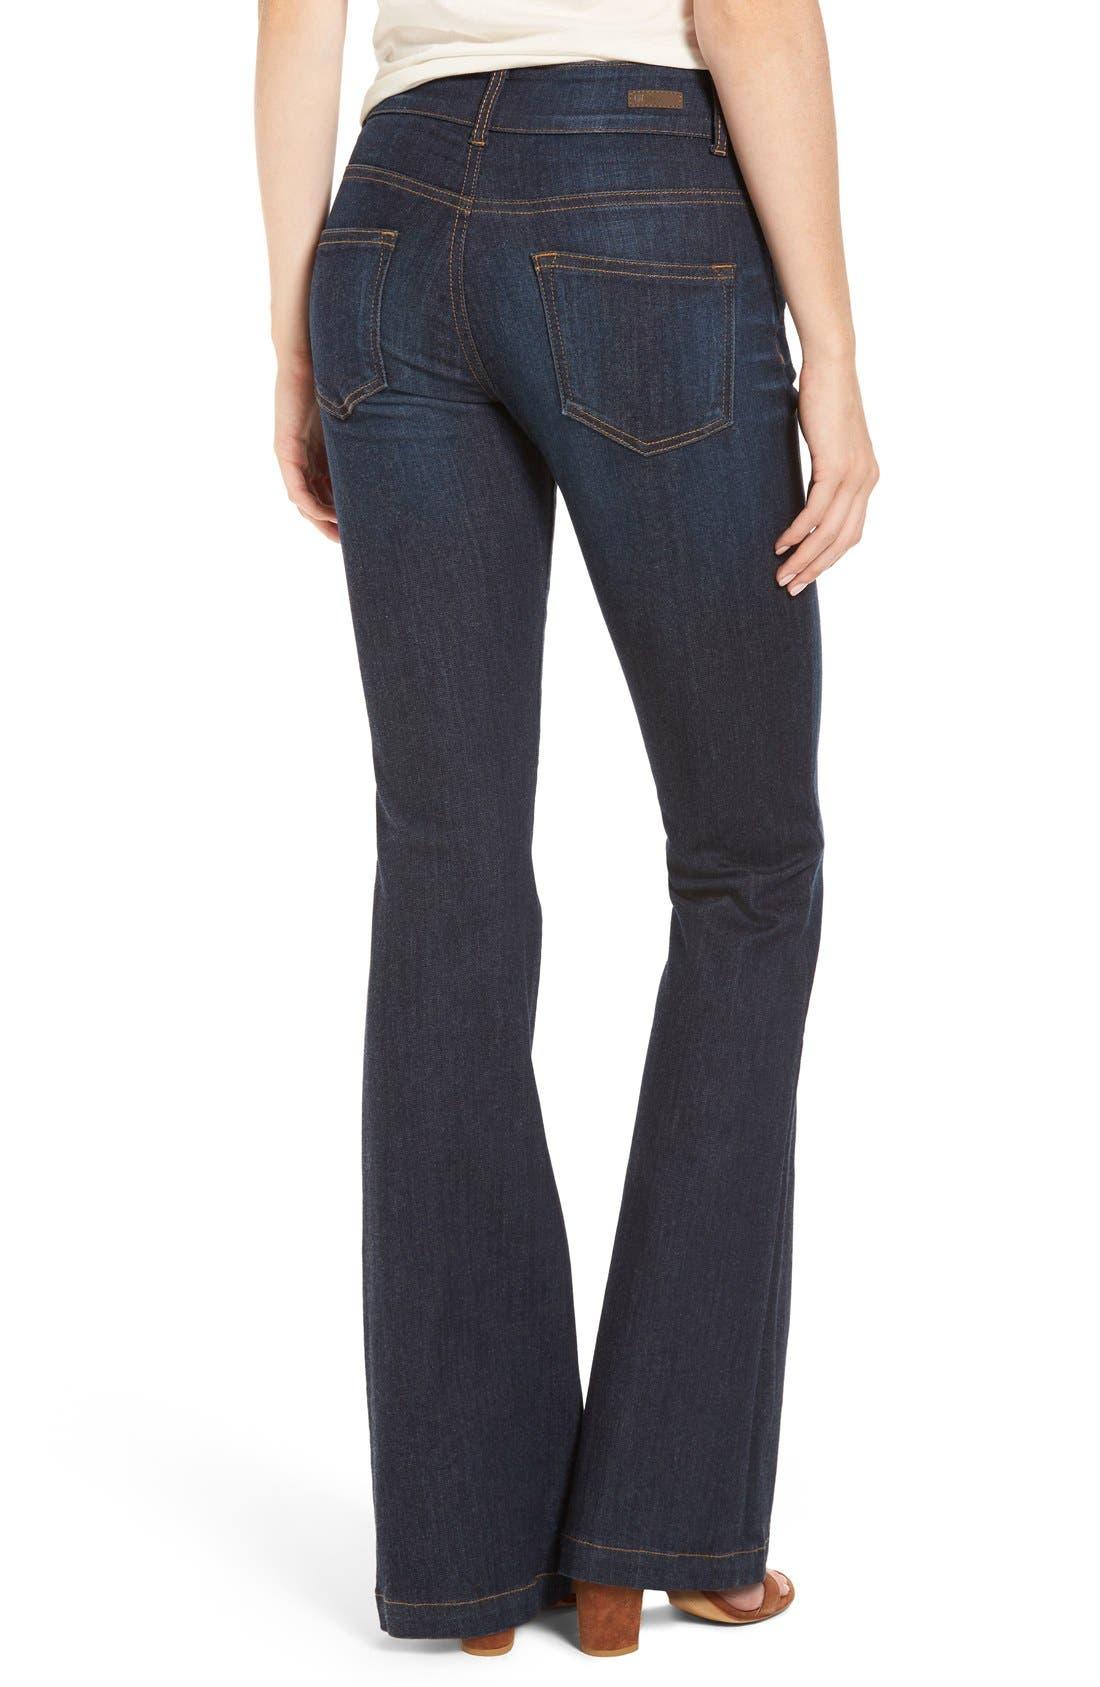 Alternate Image 2  - KUT from the Kloth 'Chrissy' Flare Leg Jeans (Brightness)